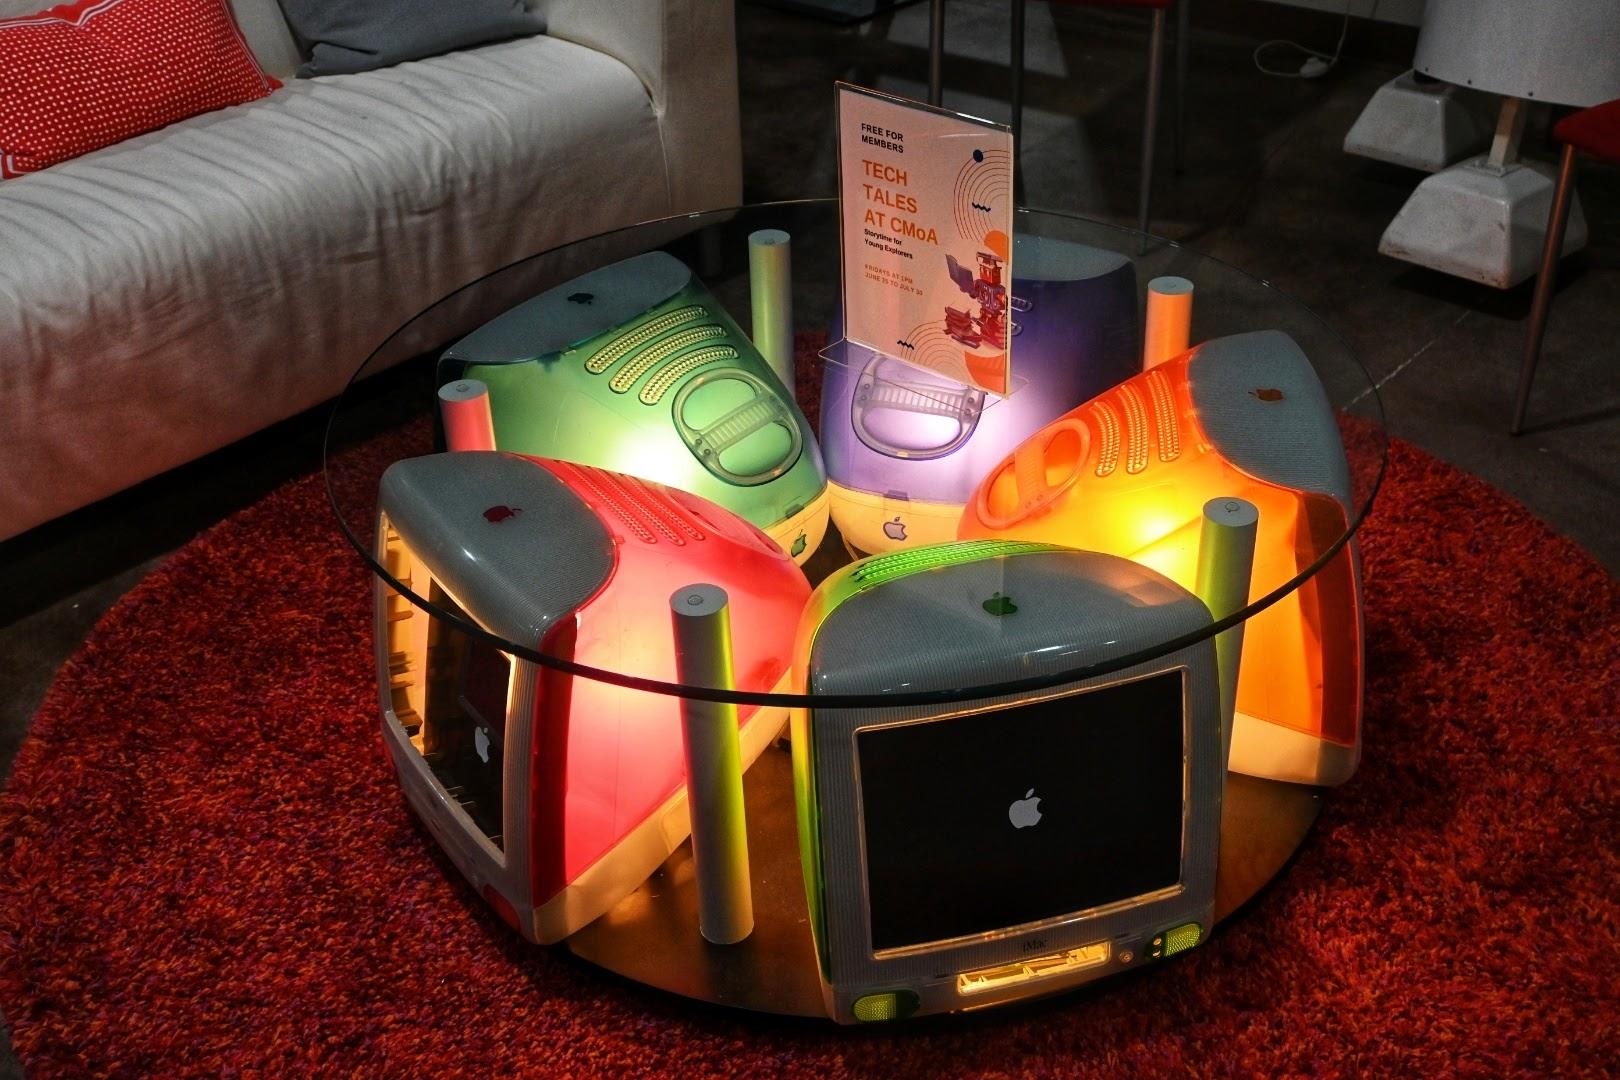 Colorful iMac Computers